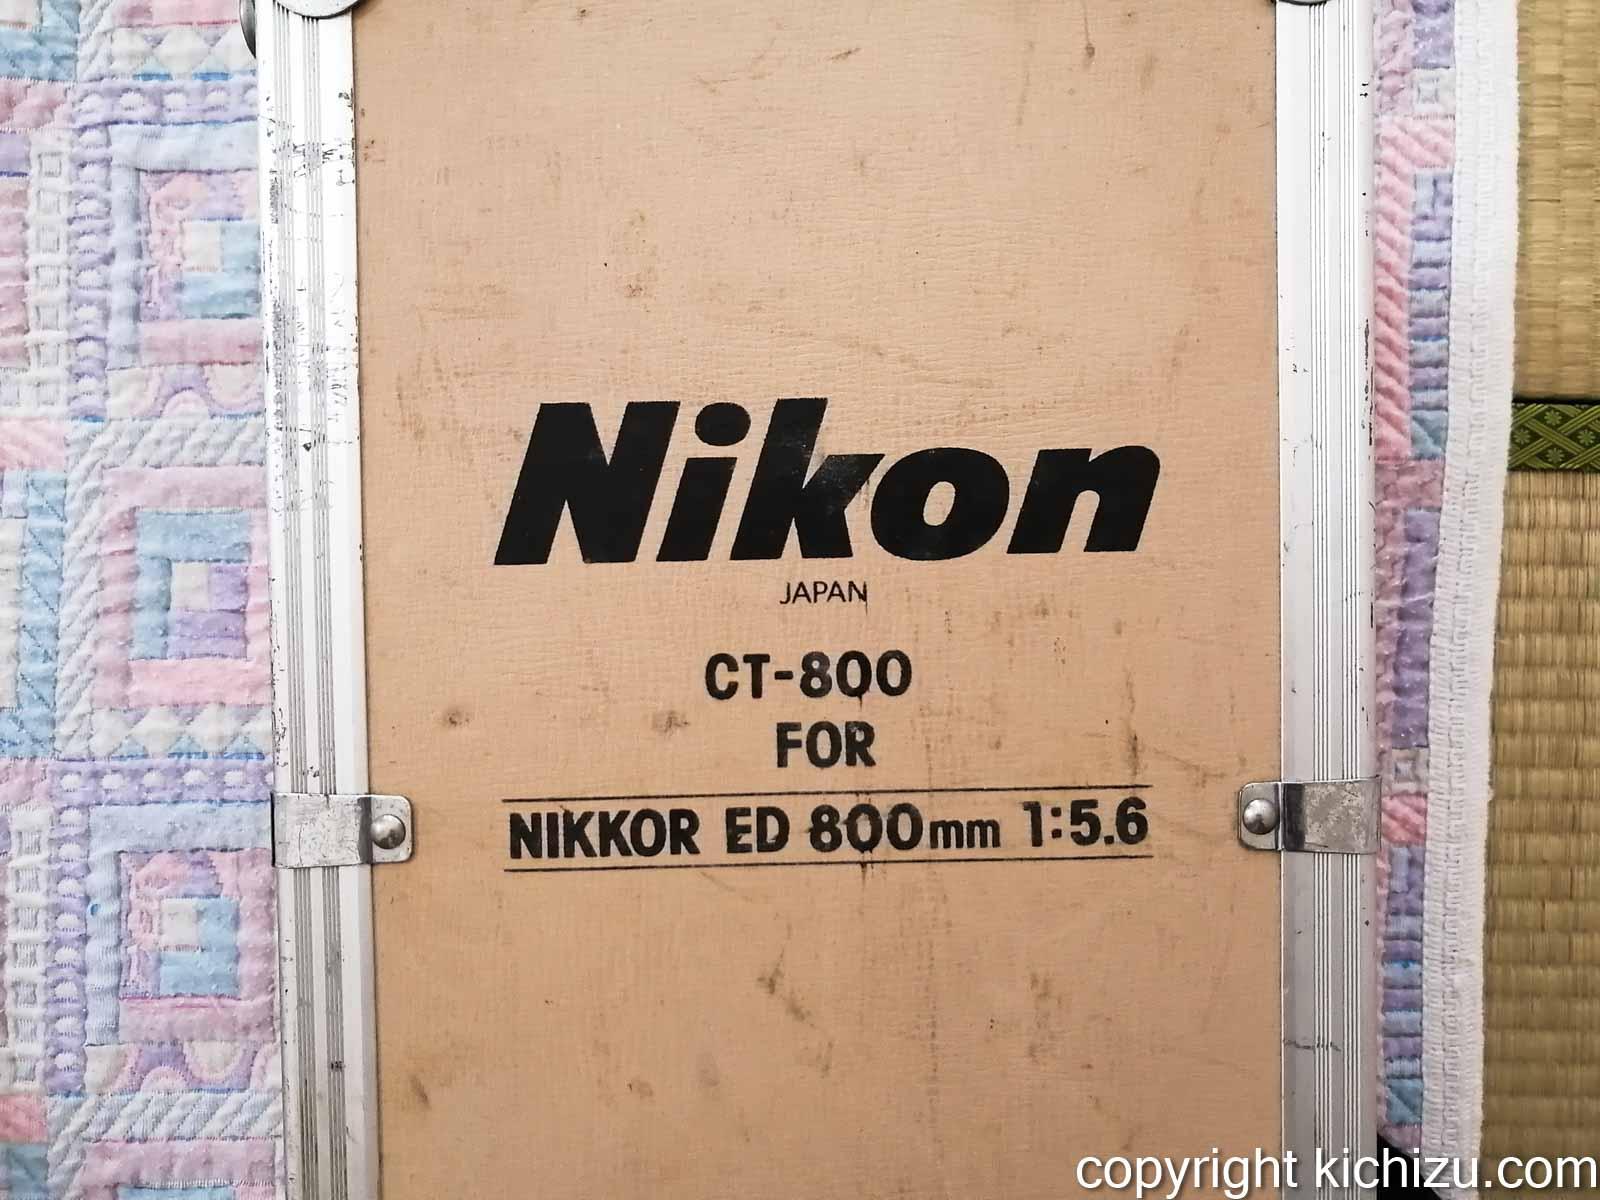 nikon CT-800 for nikkor ED 800mm 1:5.6